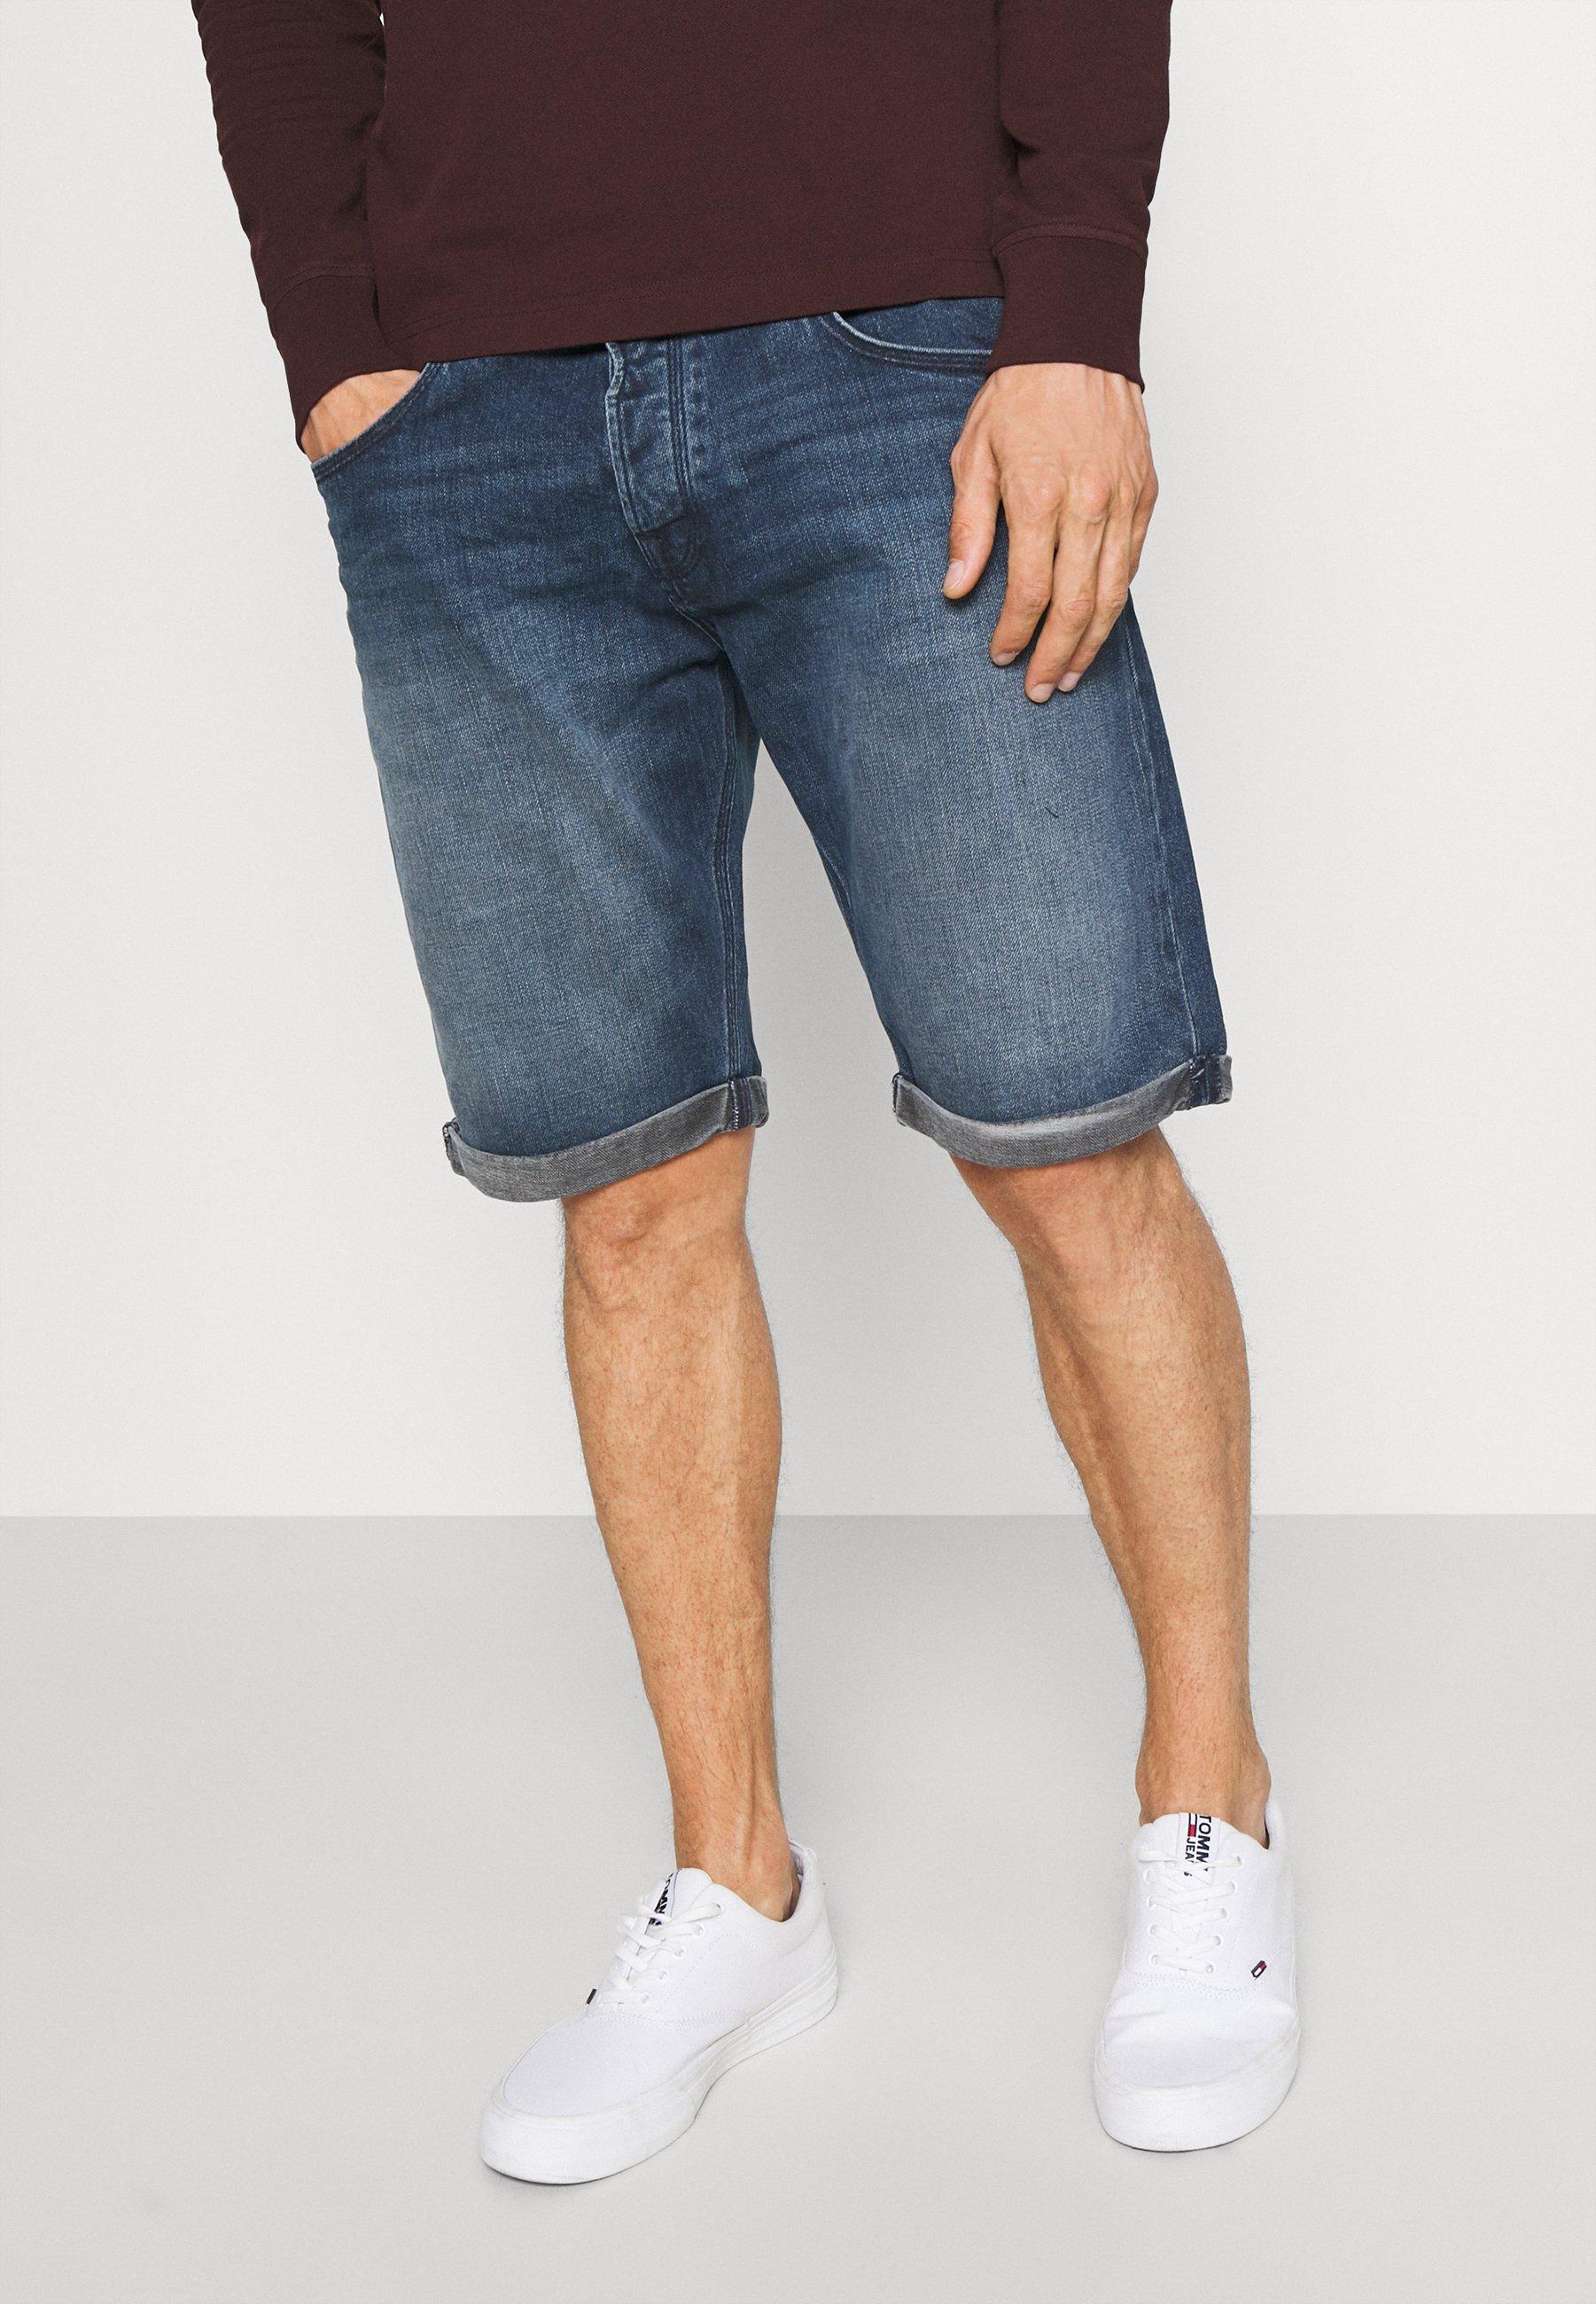 Herrer CORVIN - Jeans Short / cowboy shorts